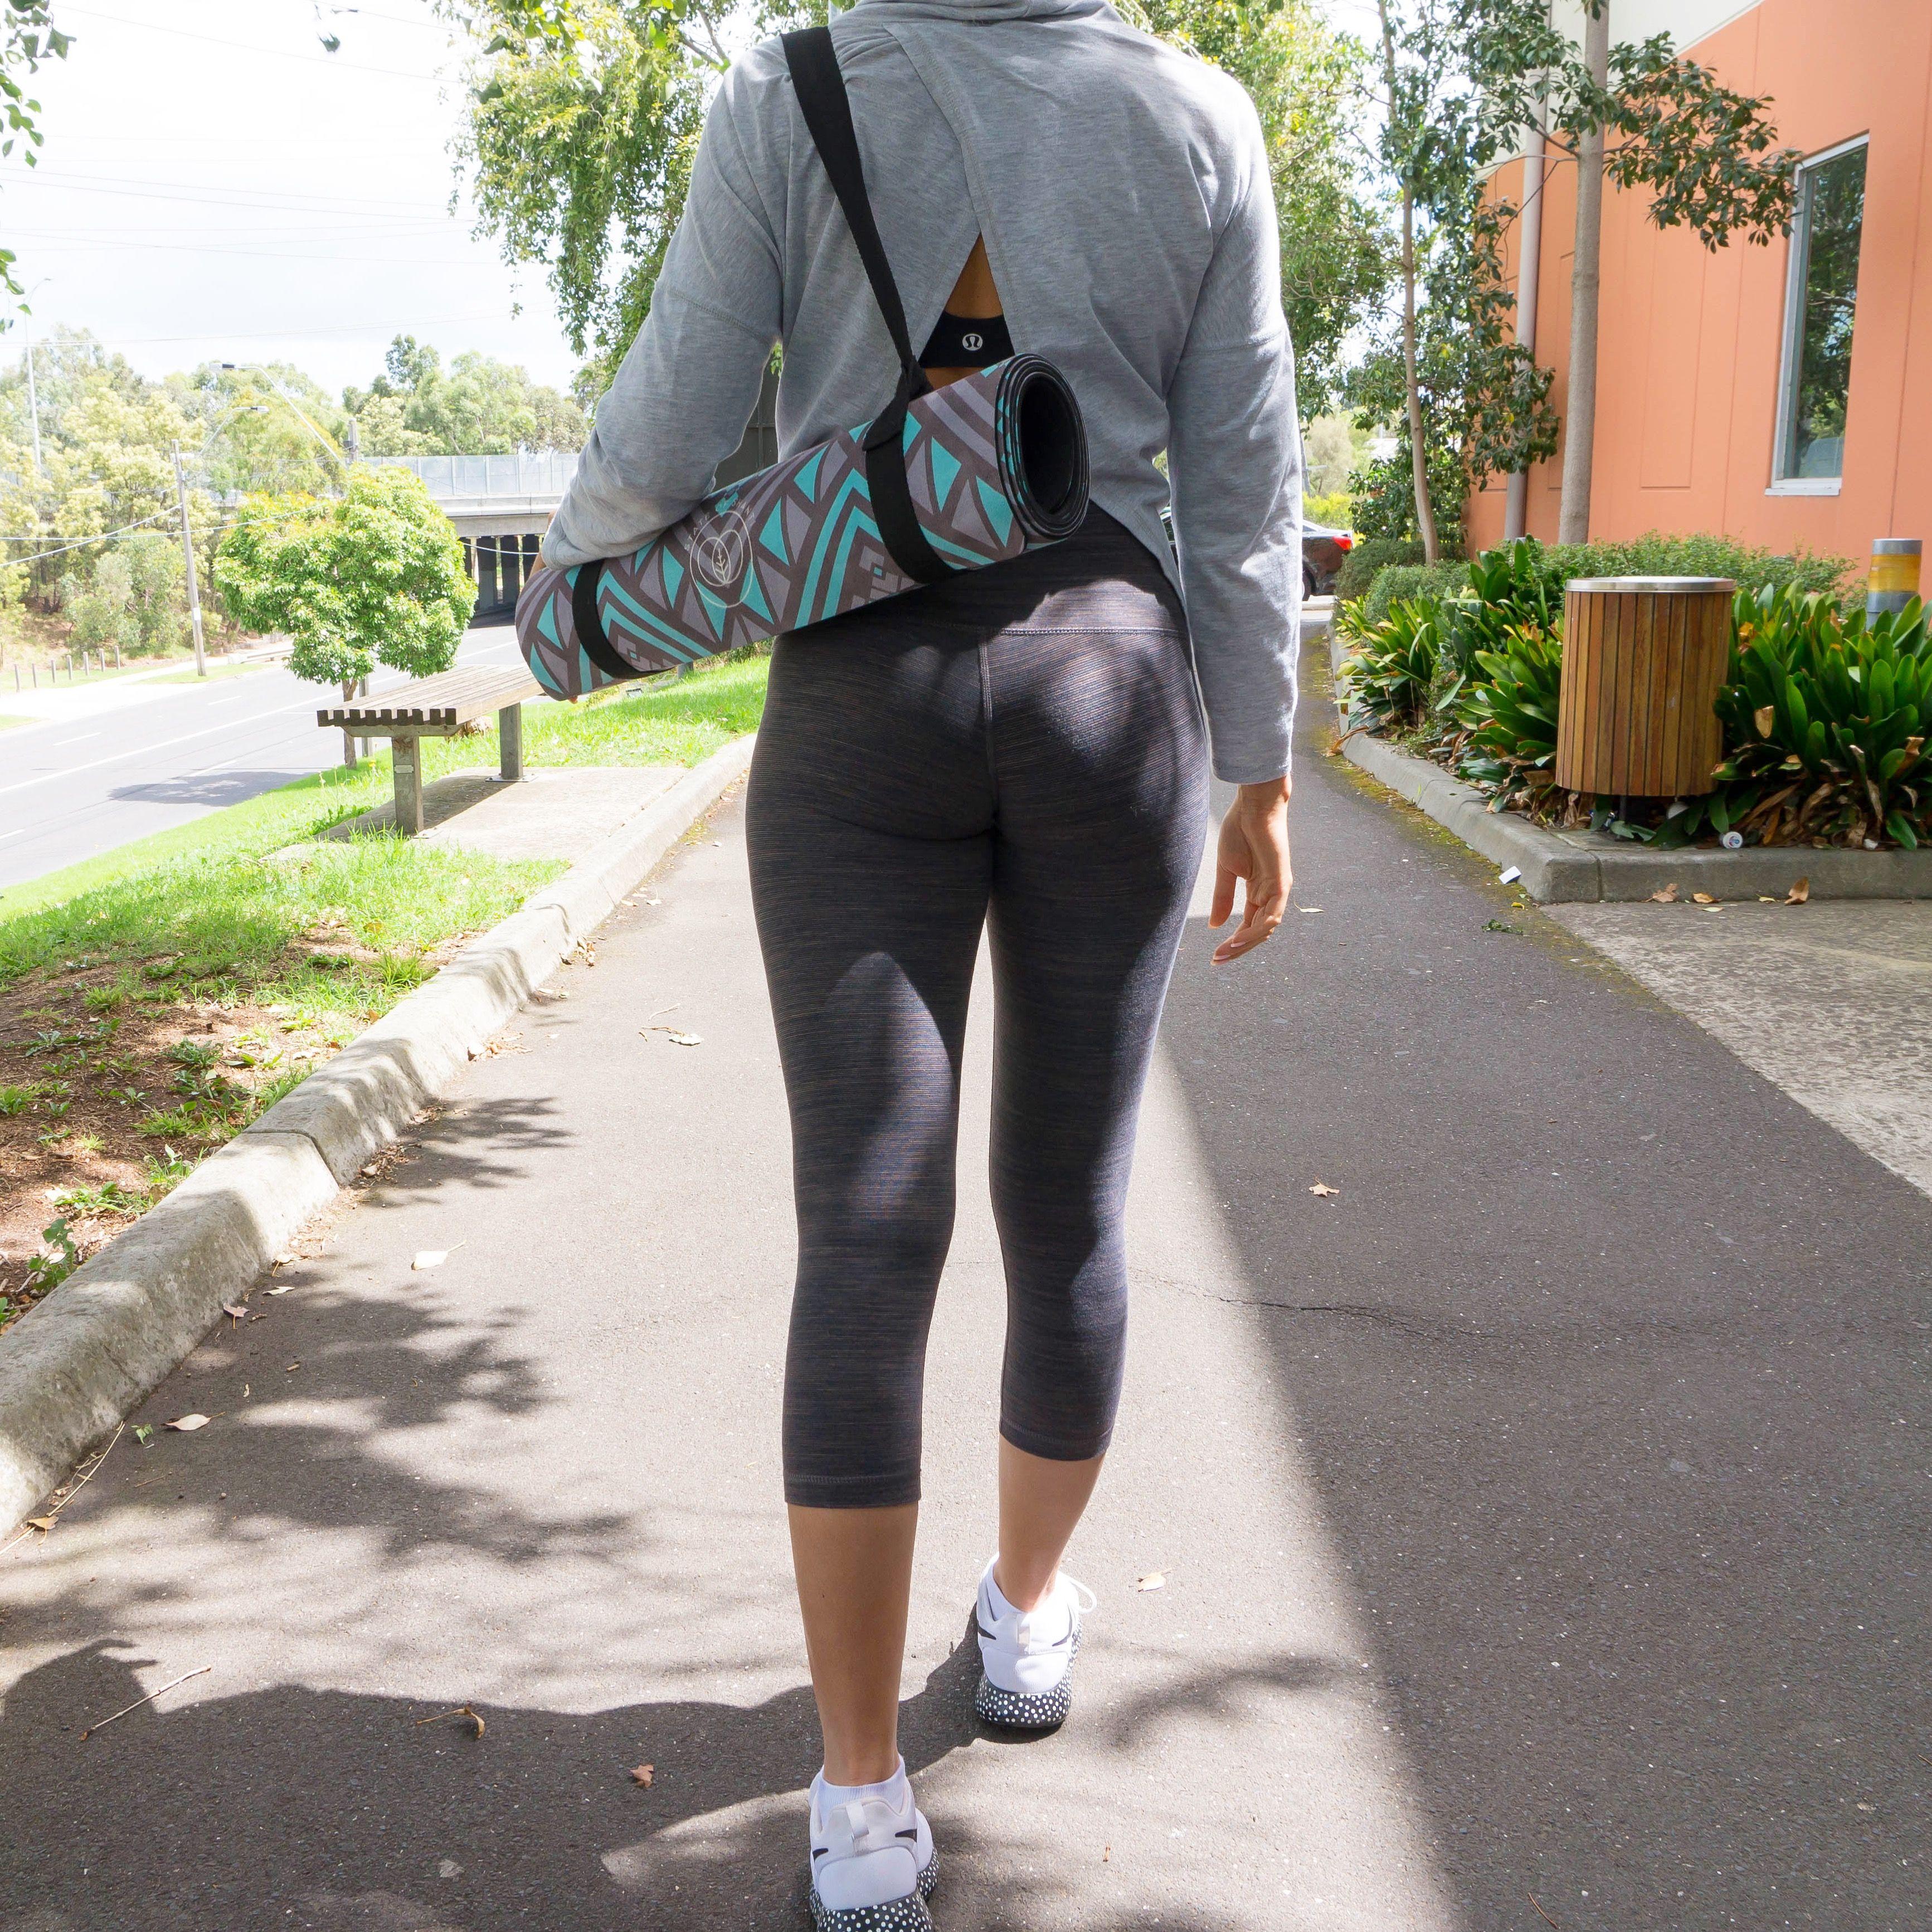 Stylish yoga mat & carry strap